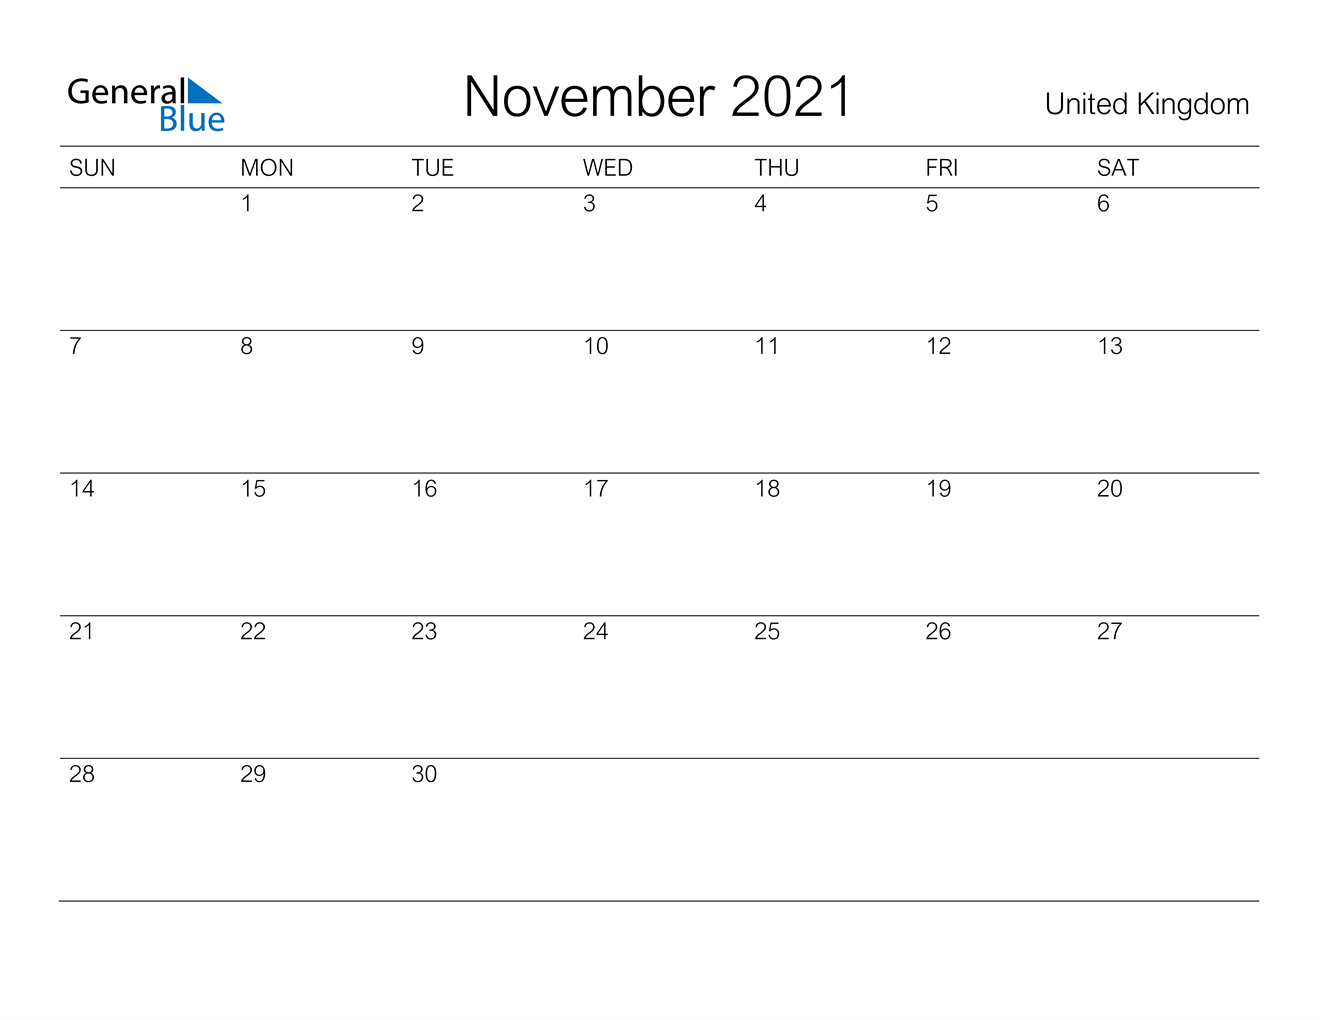 November 2021 Calendar - United Kingdom